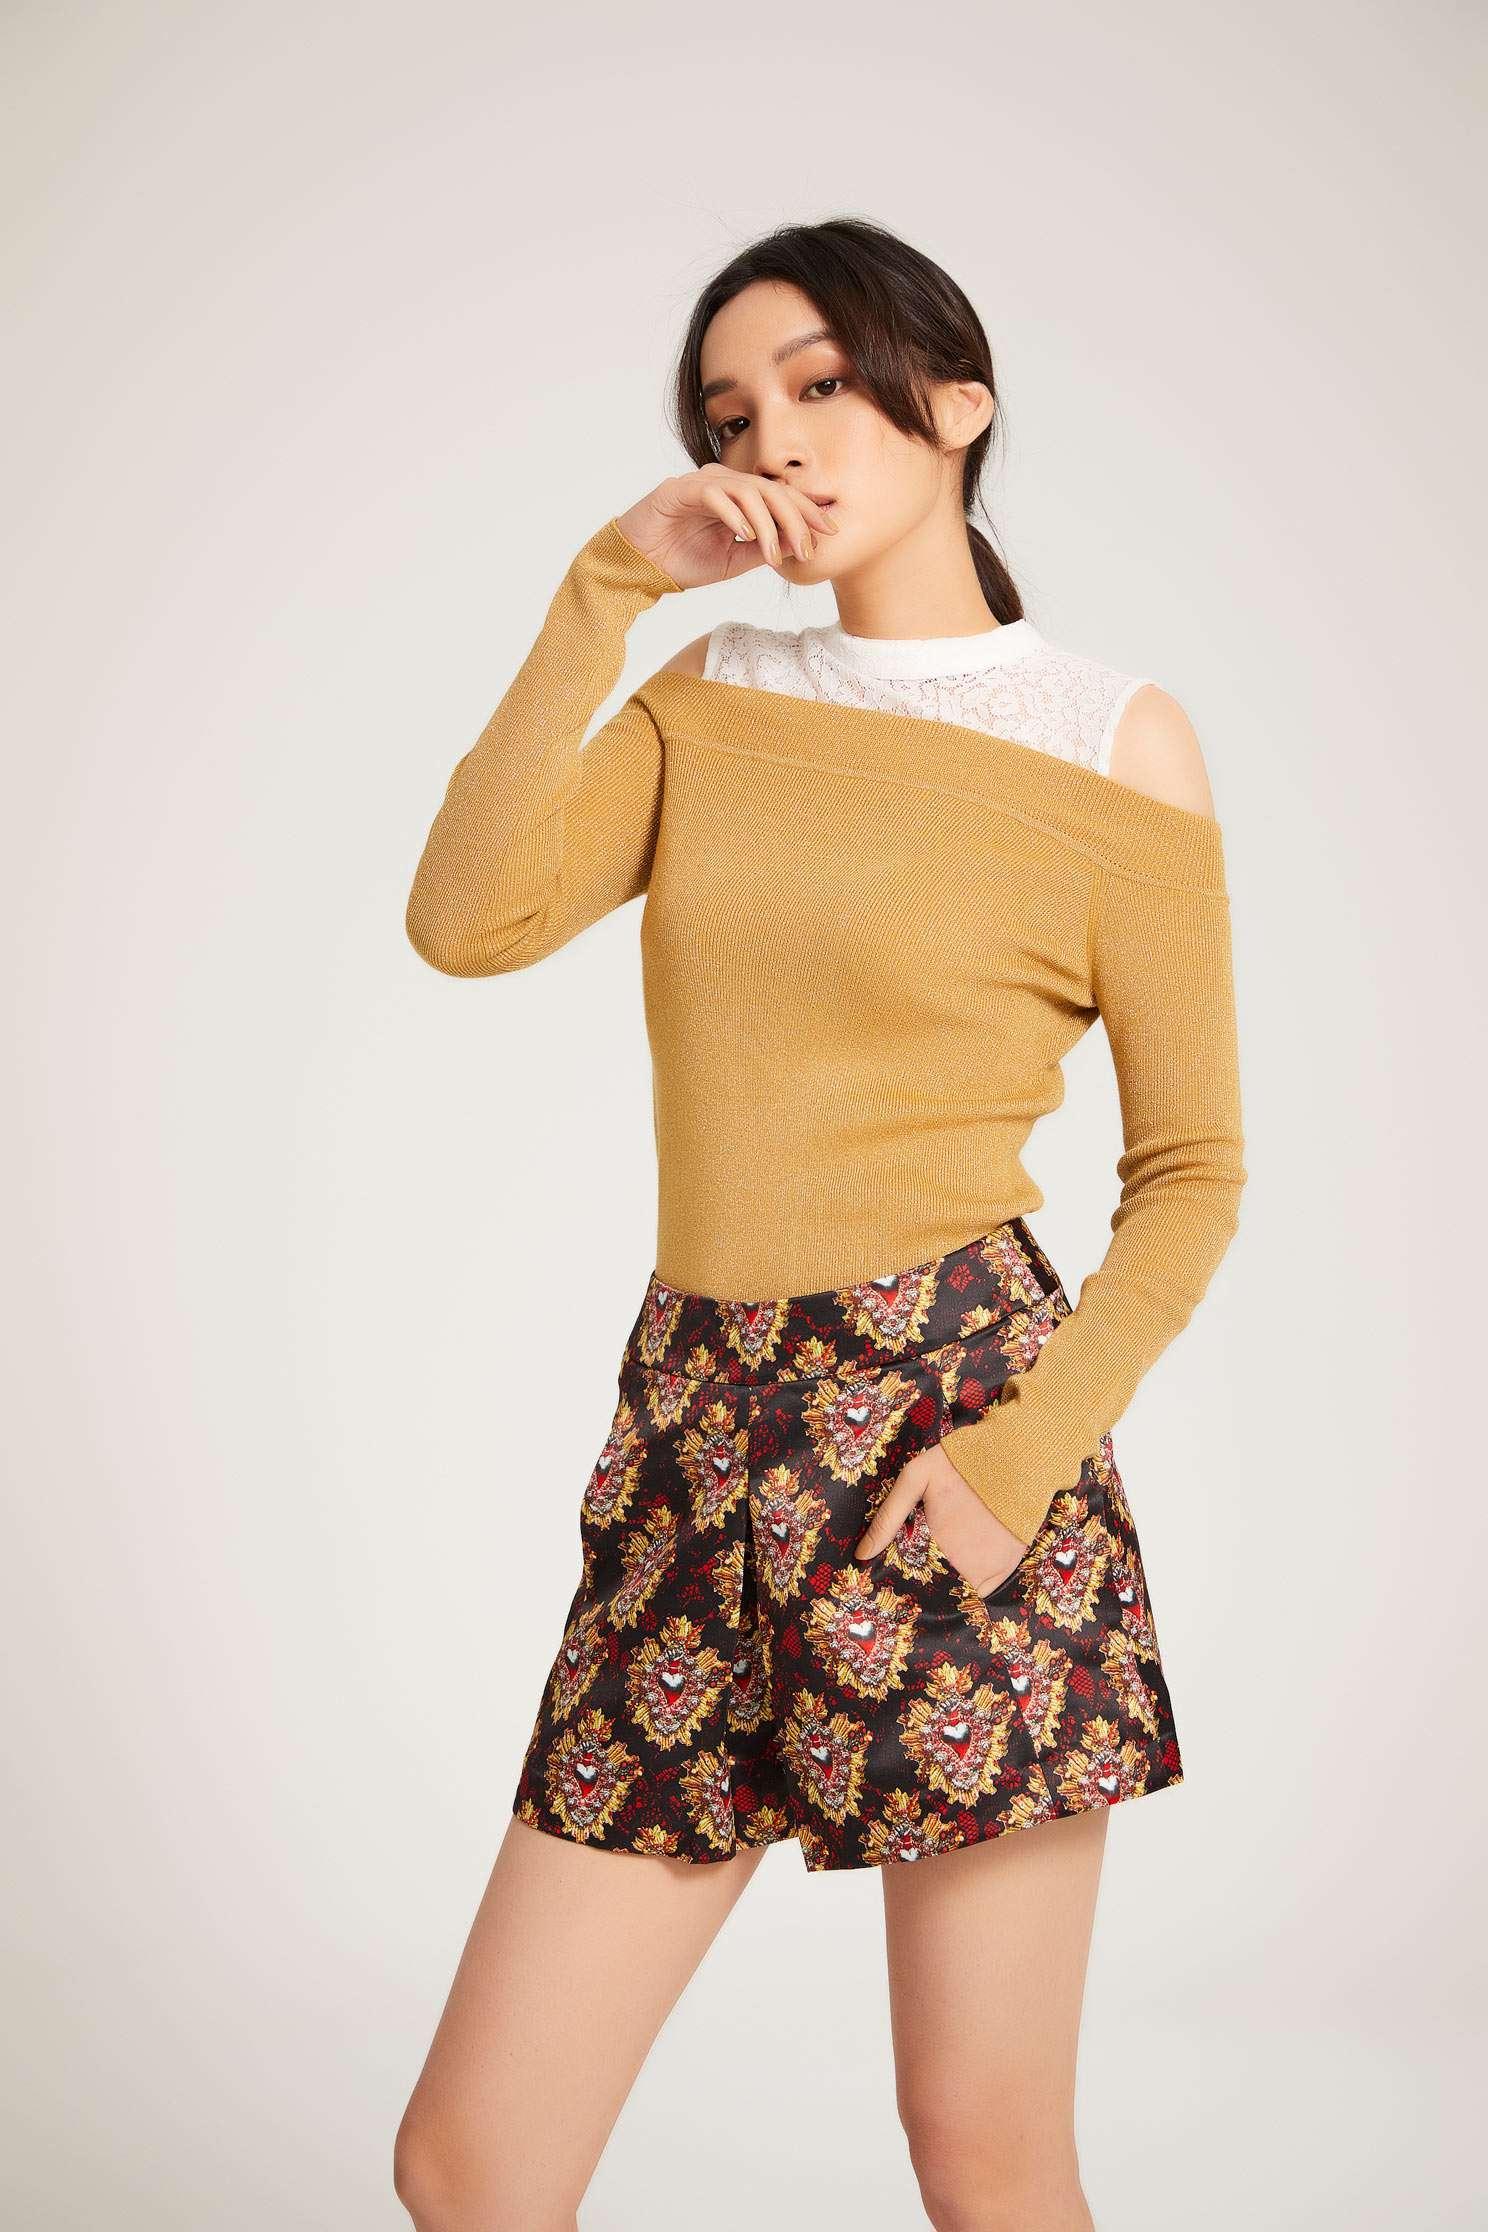 Geometric print shorts,Shorts,Fantasy purple,Culottes